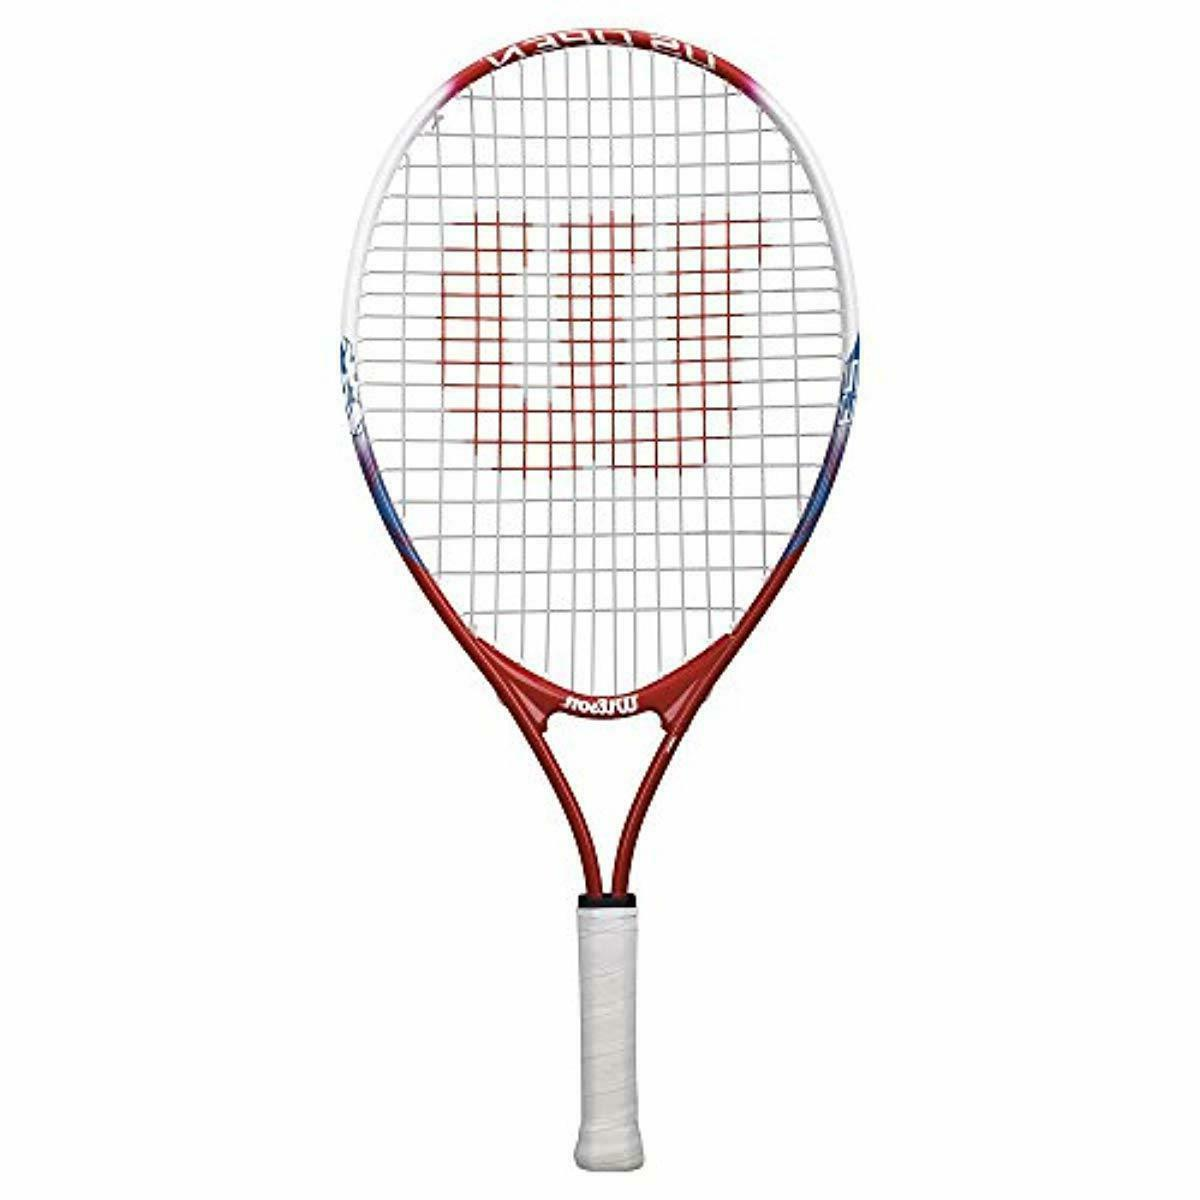 23 inch tennis racket for beginner juniour